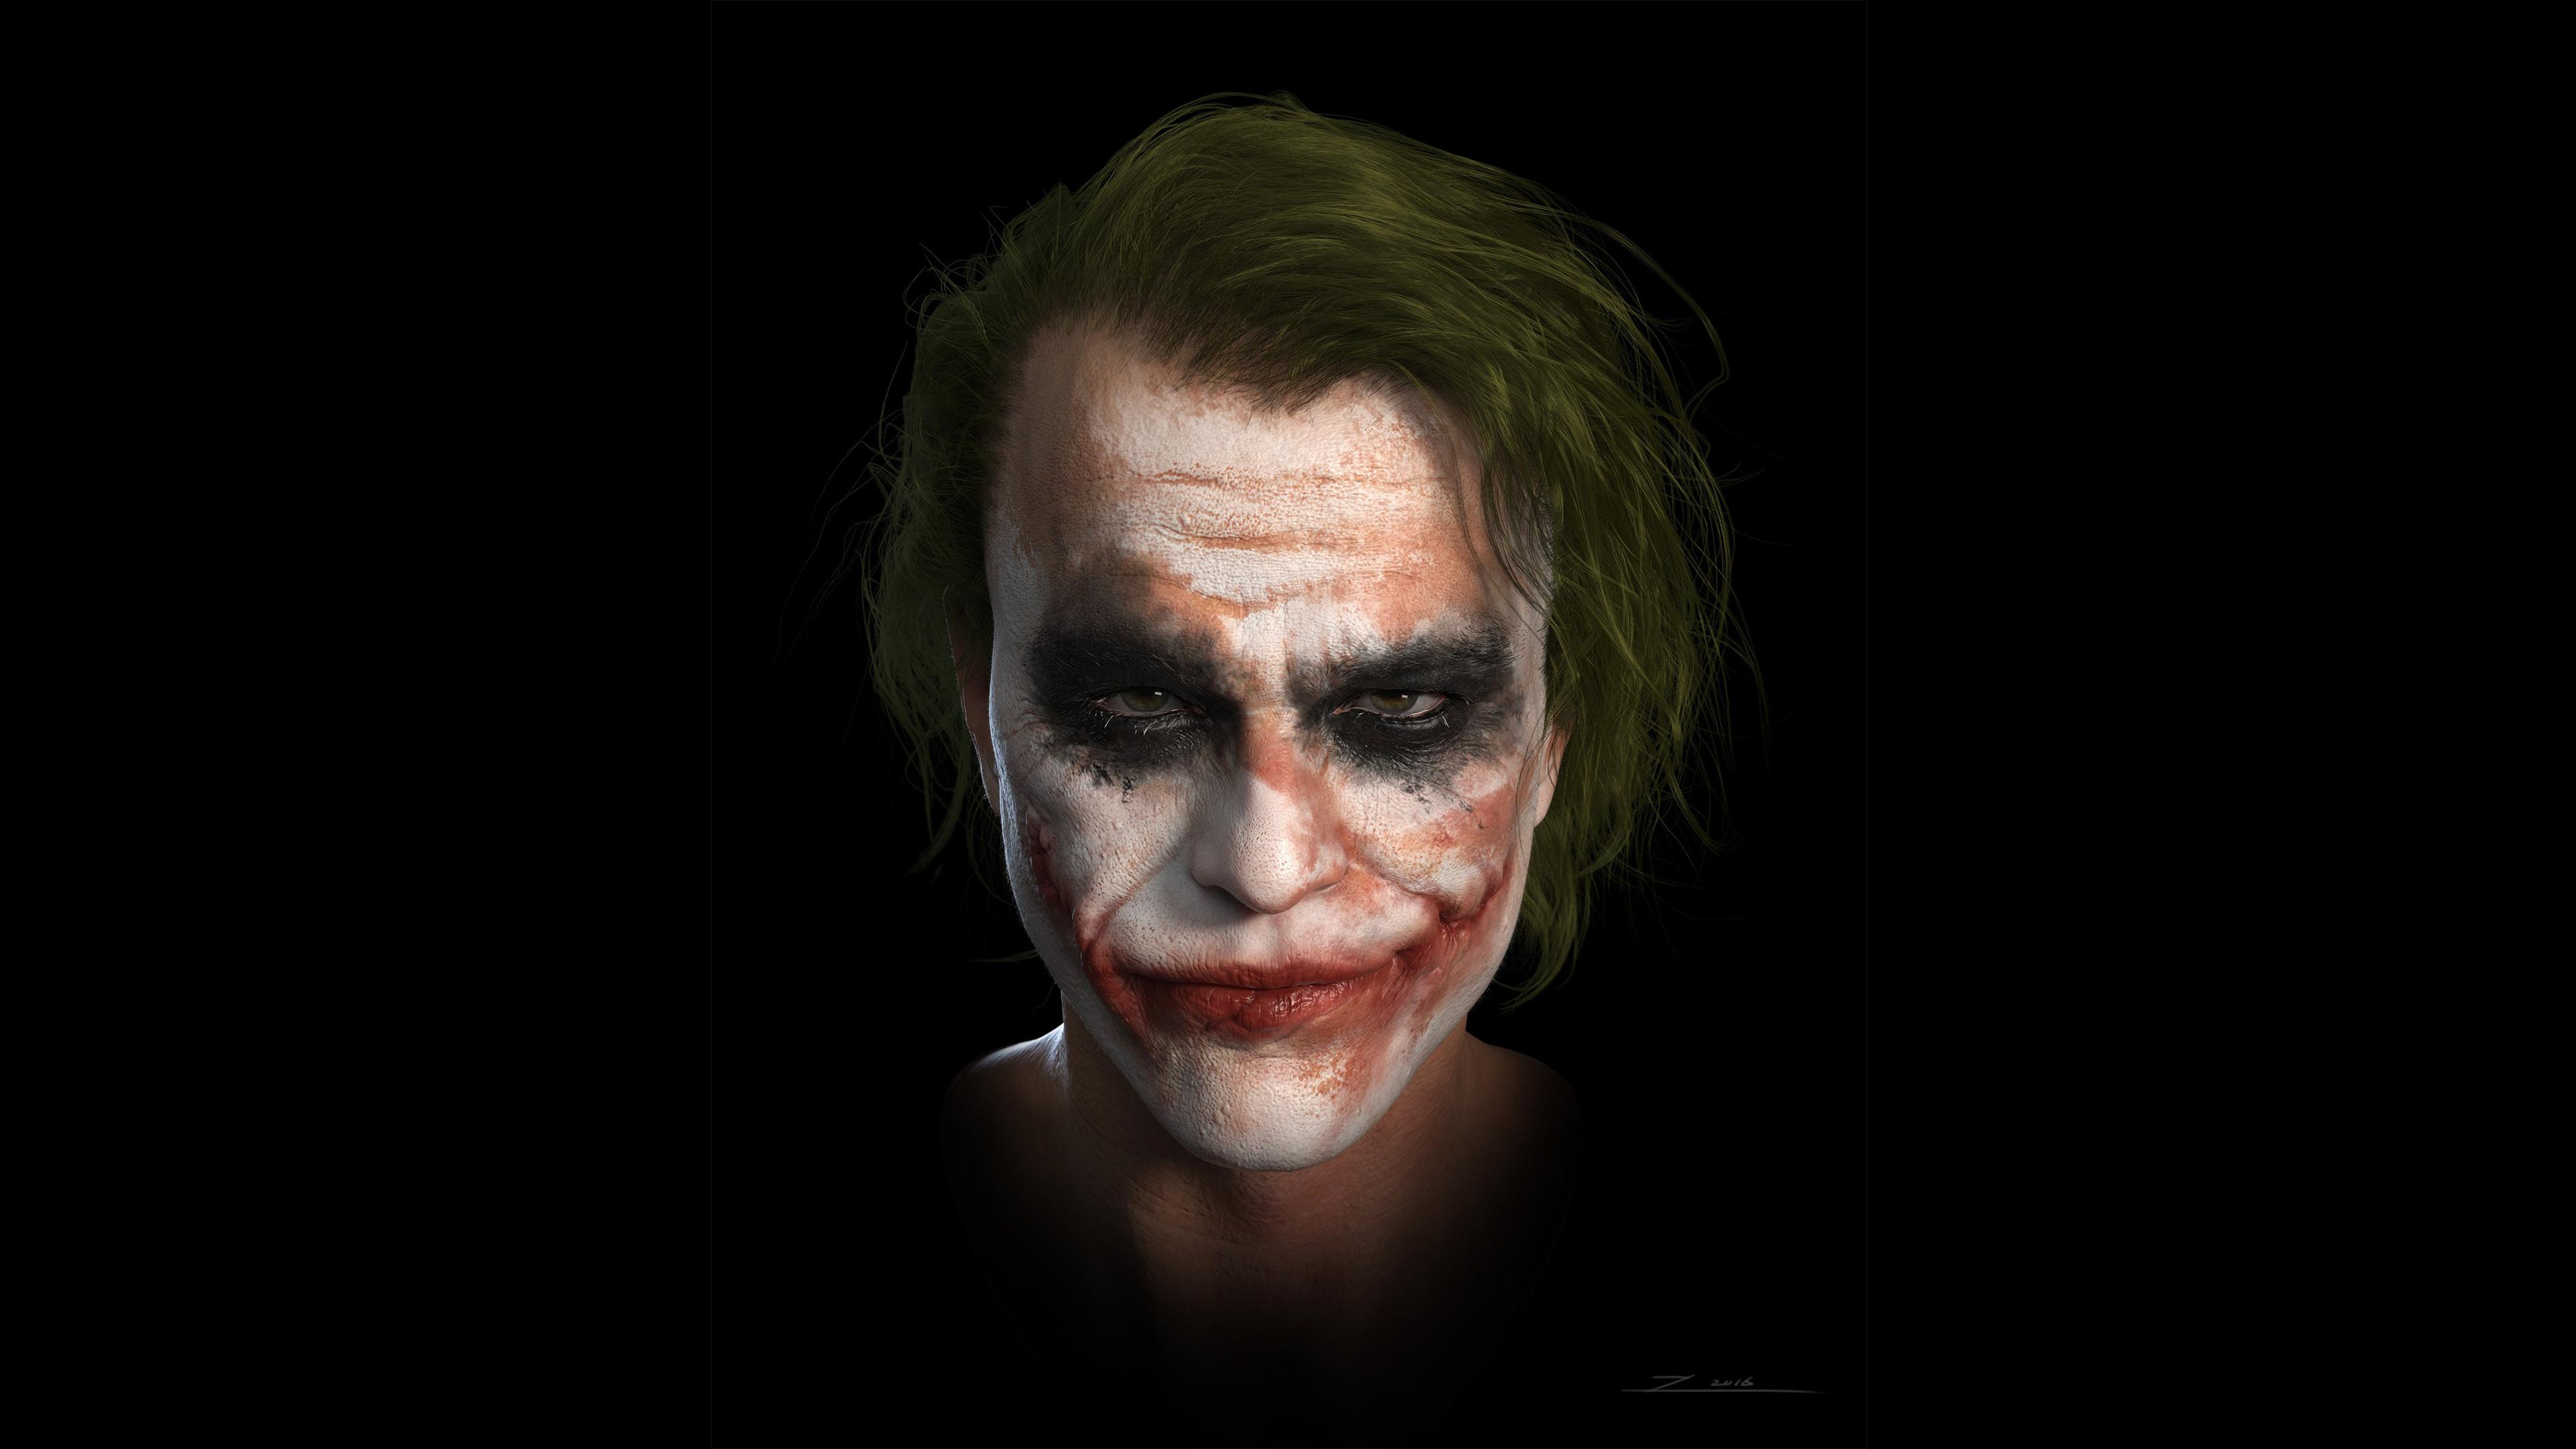 1600x1200 Joker Heath Ledger 4k Art 1600x1200 Resolution Hd